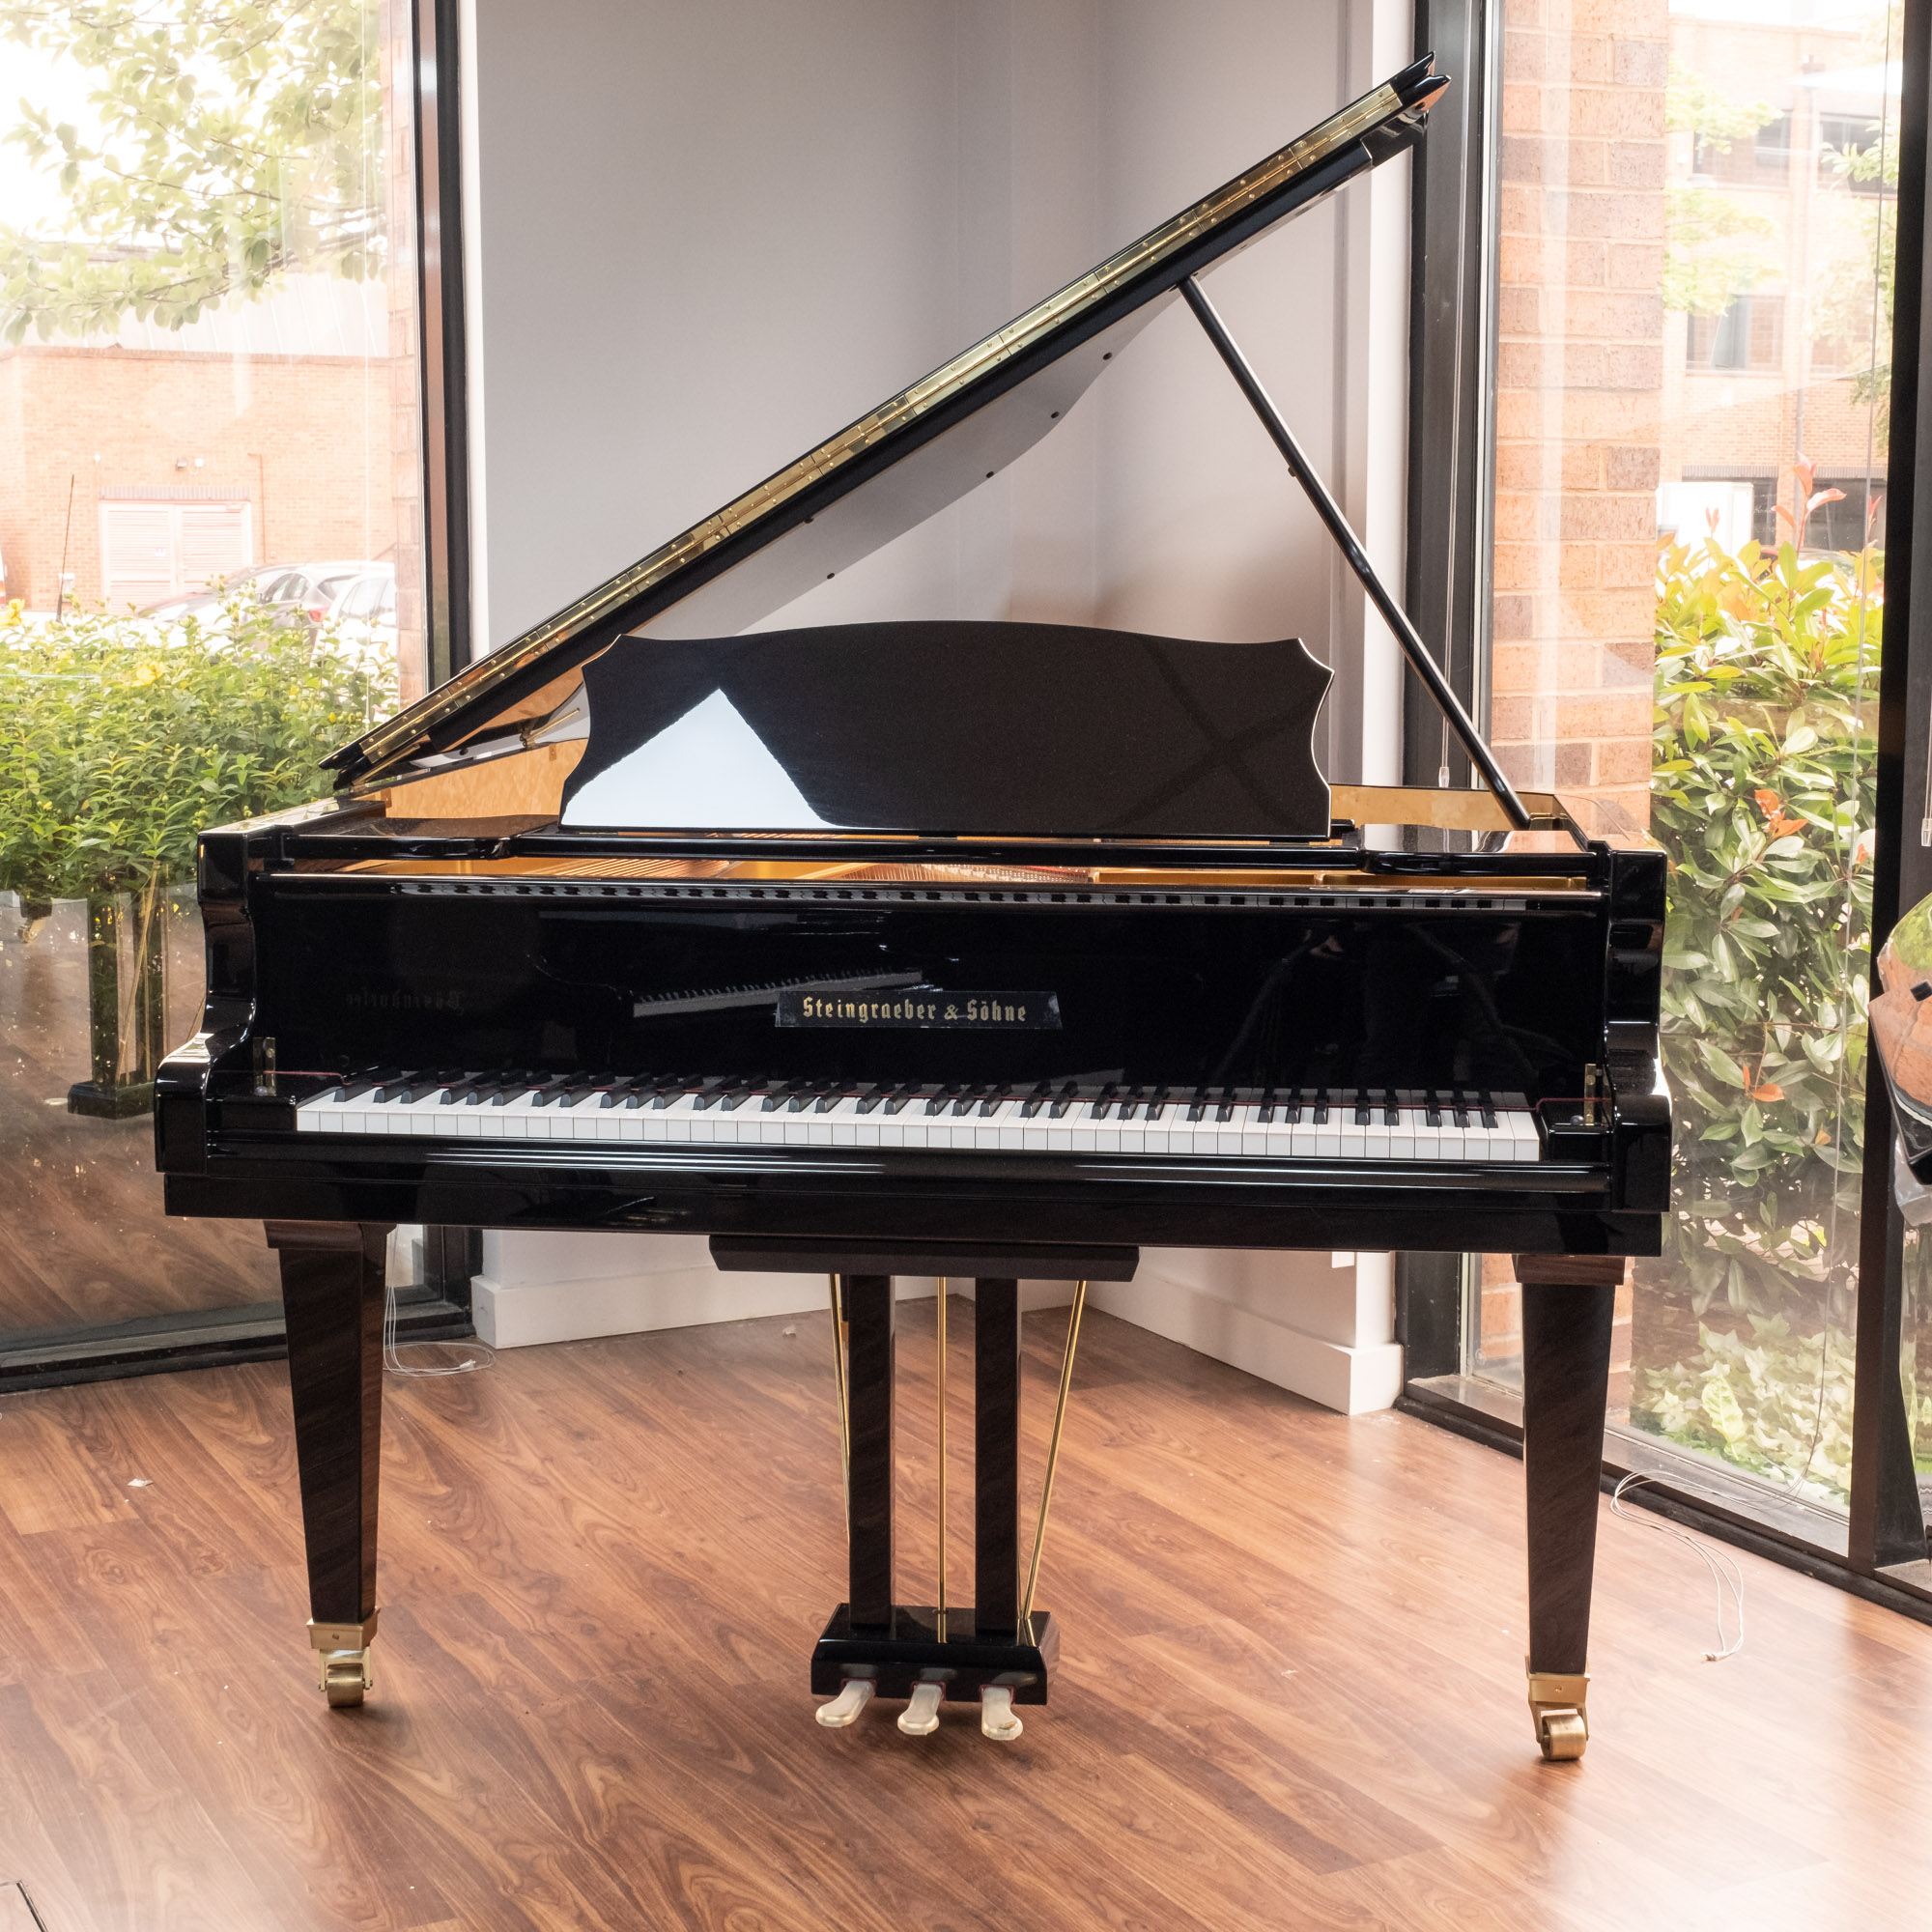 Steingraeber & Sohne B-192 Grand Piano